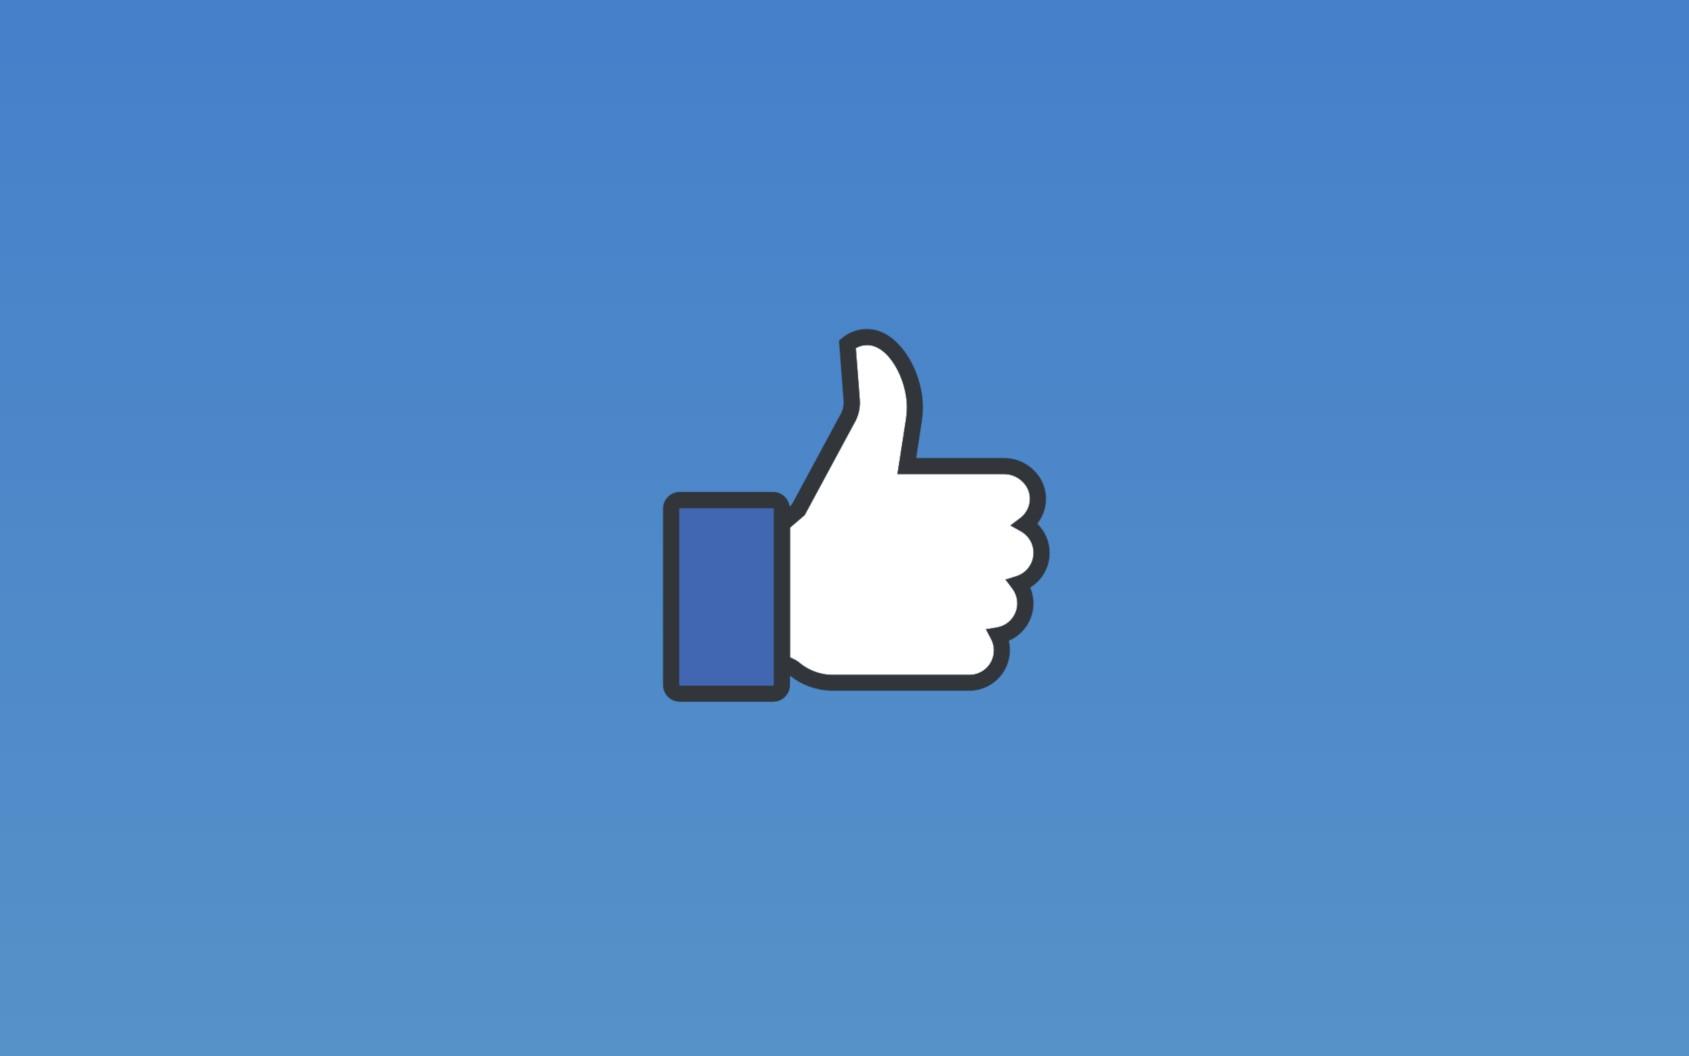 facebook stranky tit